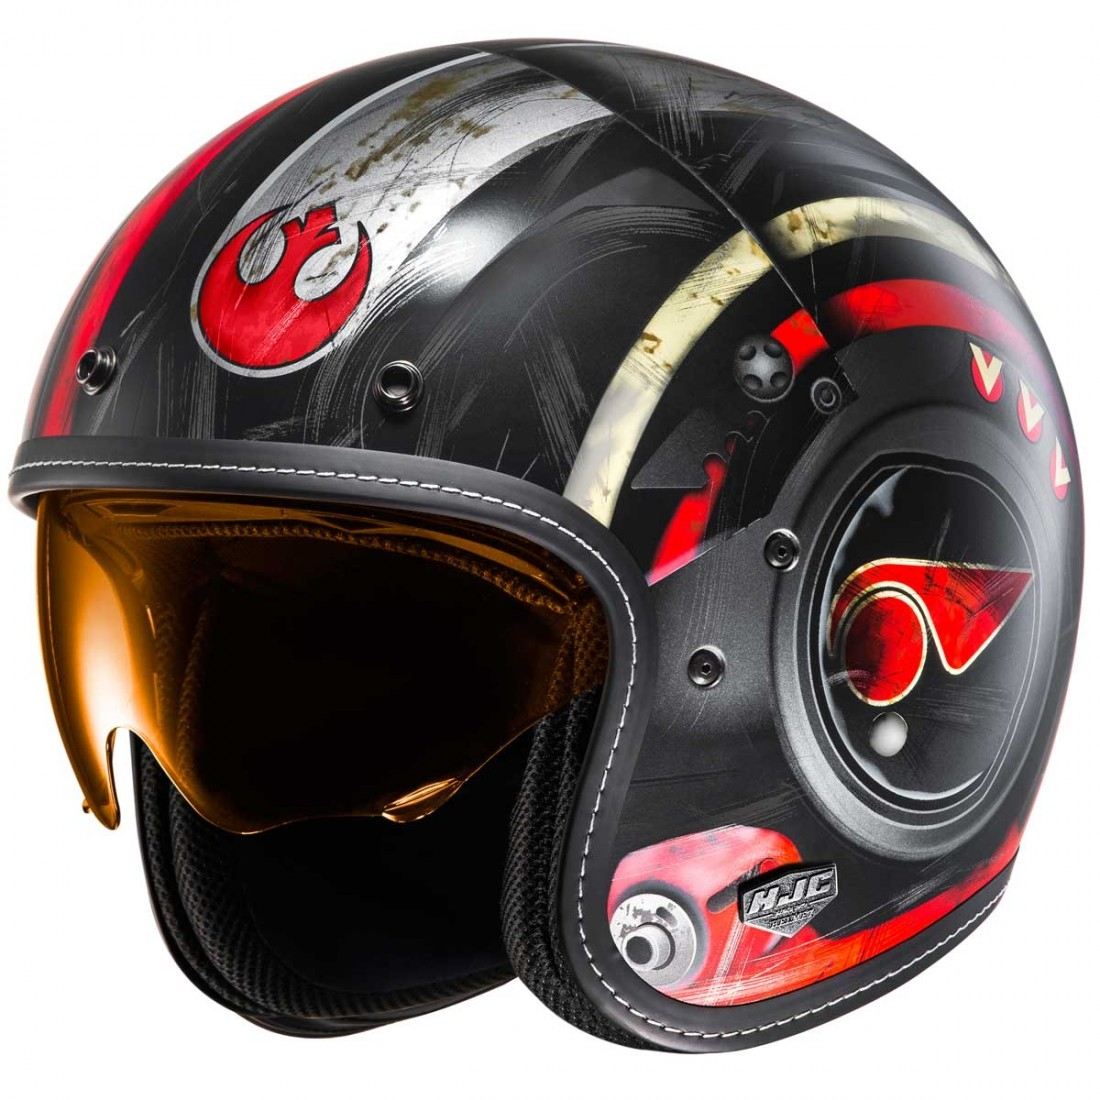 hjc fg 70s poe dameron star wars mc 1sf helmet motocard. Black Bedroom Furniture Sets. Home Design Ideas